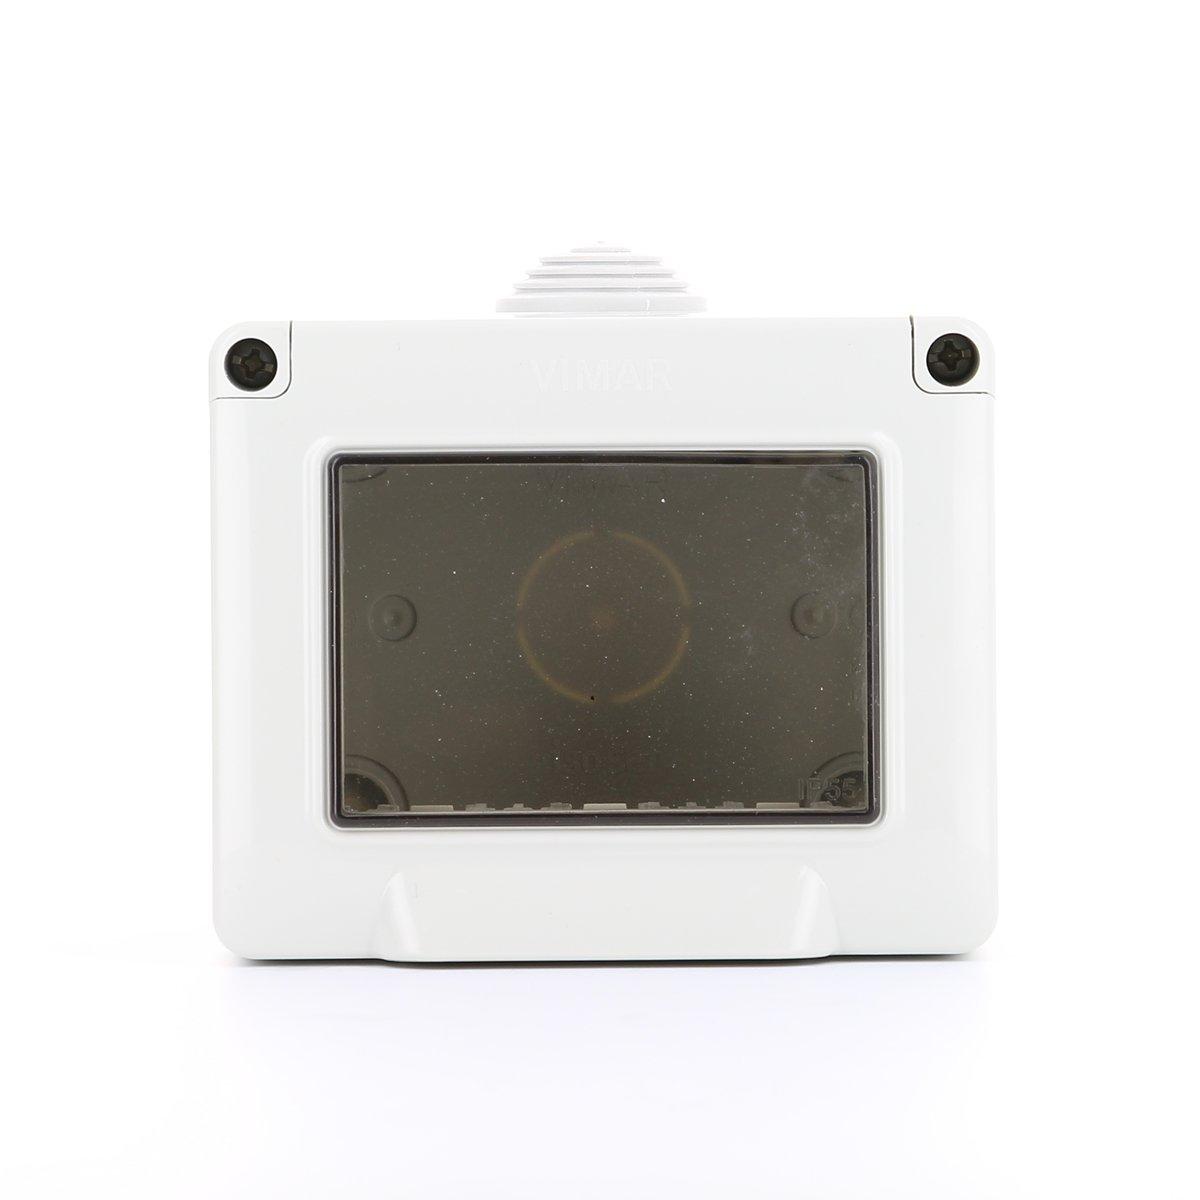 Vimar Eikon Series Surface scatole box IP55/3/modulo//Series Flat